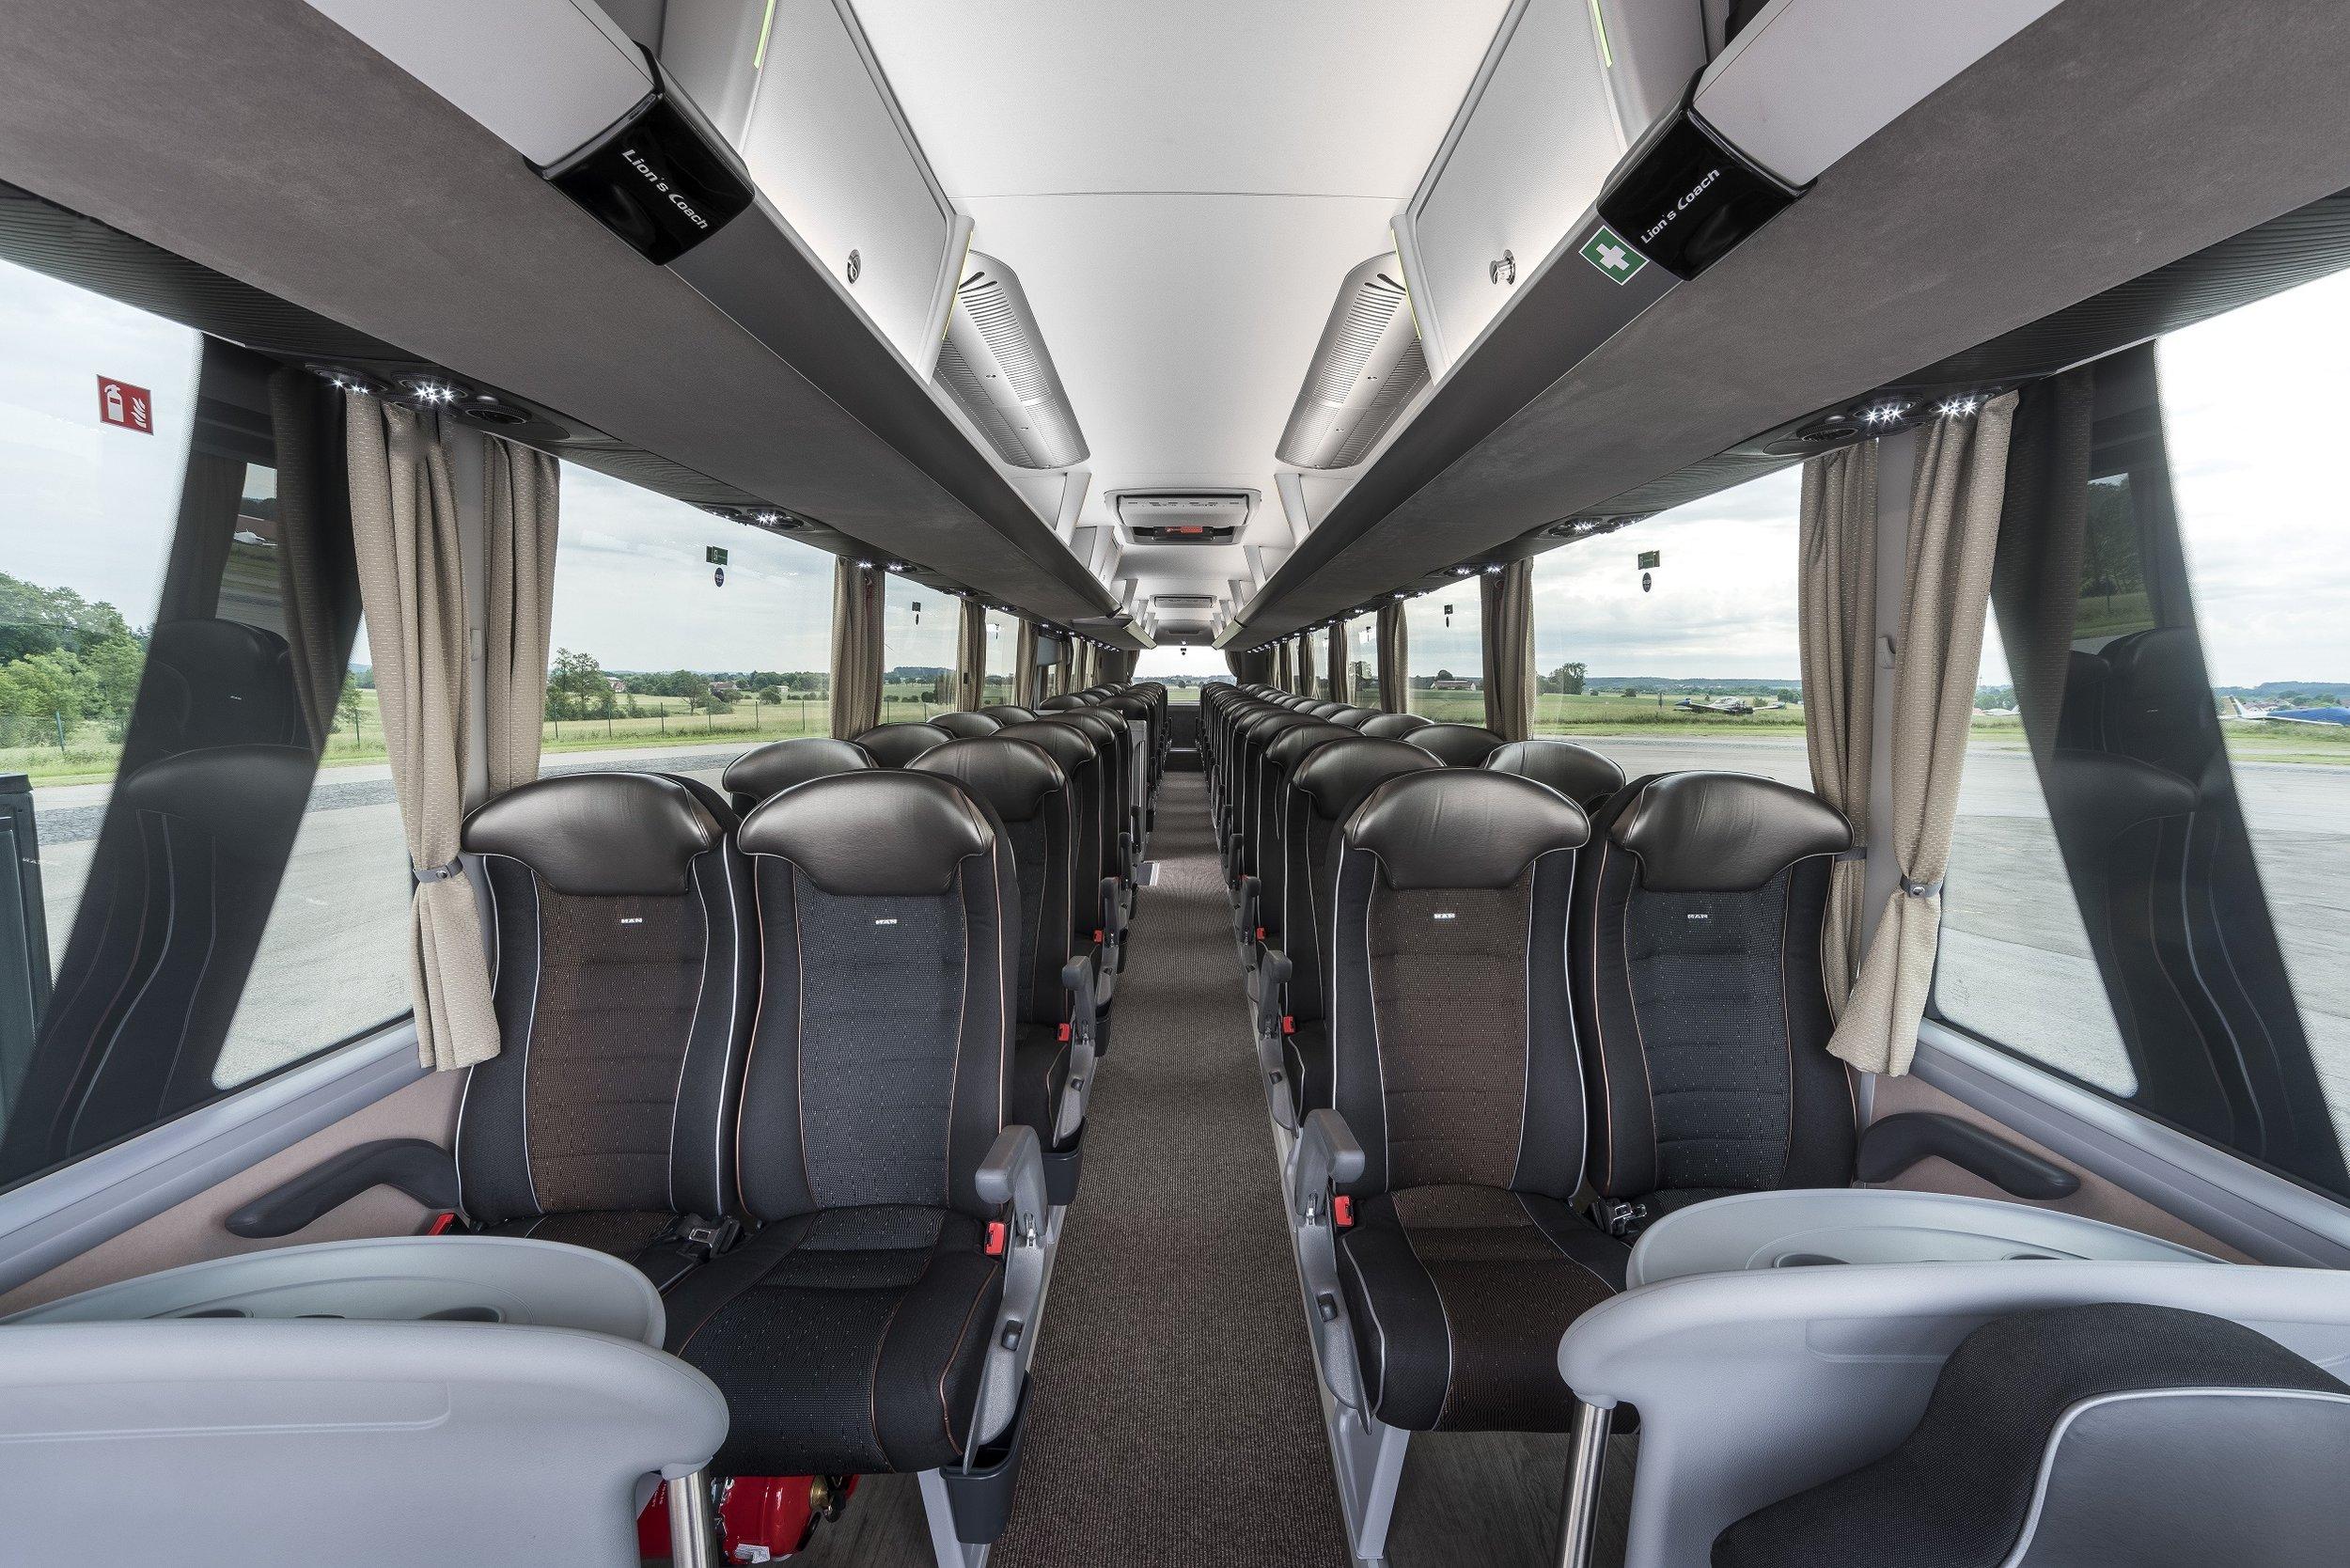 Pohled do interiéru nového MAN Lion's Coach. (foto: MAN Truck & Bus)